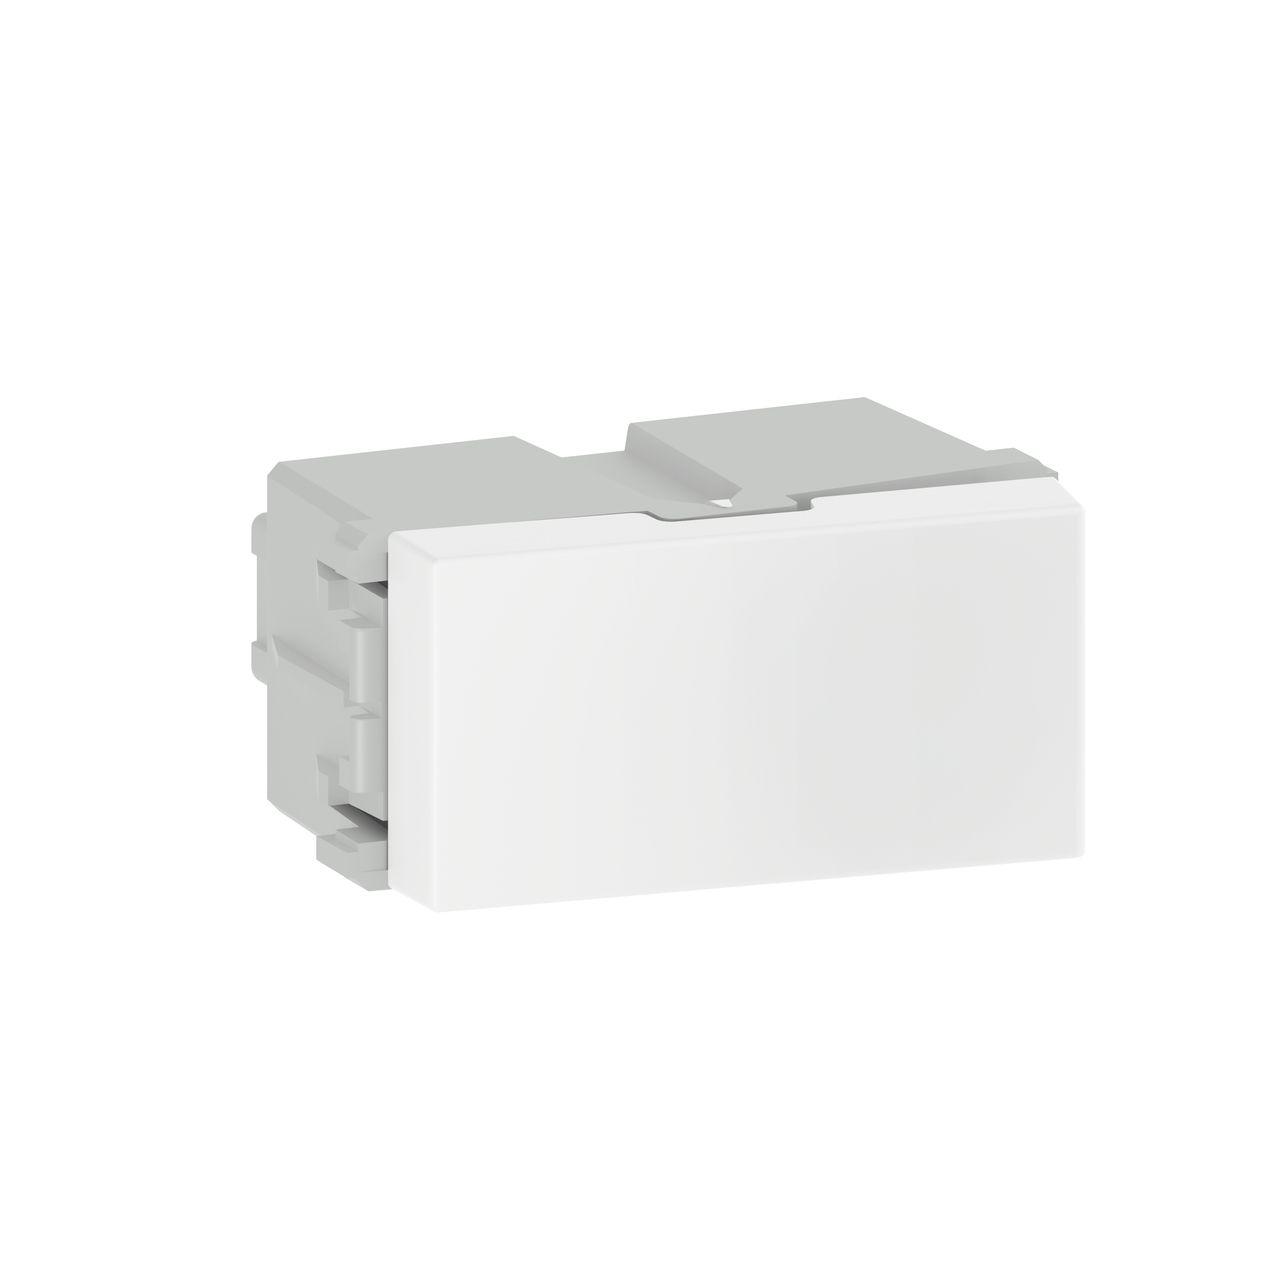 INTERRUPTOR SIMPLES 10A/250V REFINATTO